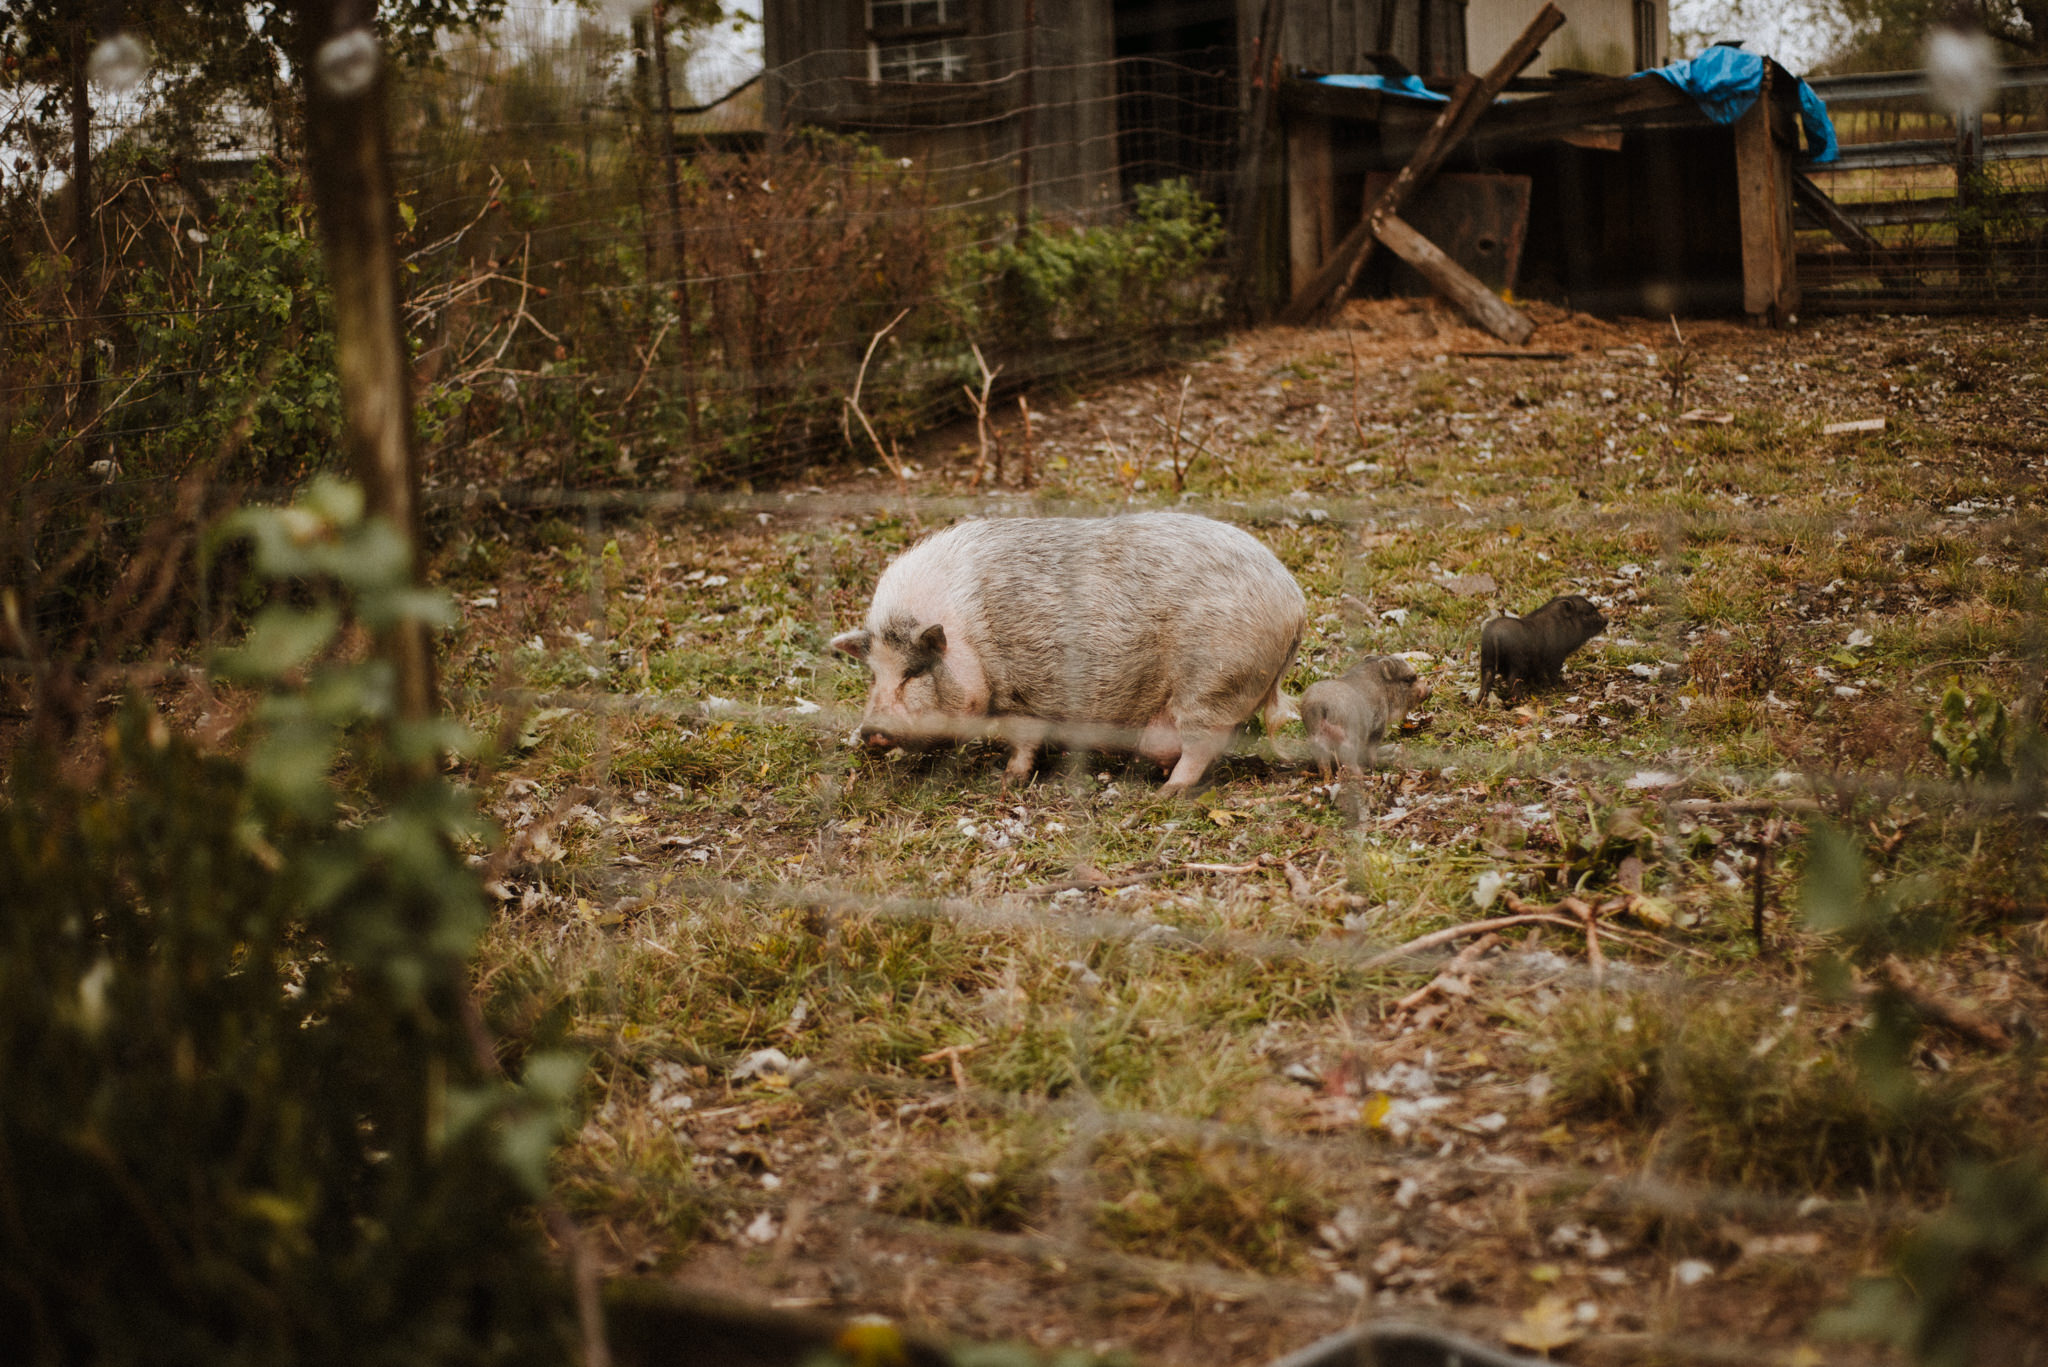 ApkePhotography_Tricia+Mike_WestVirginiaWedding_Farm_10.jpg